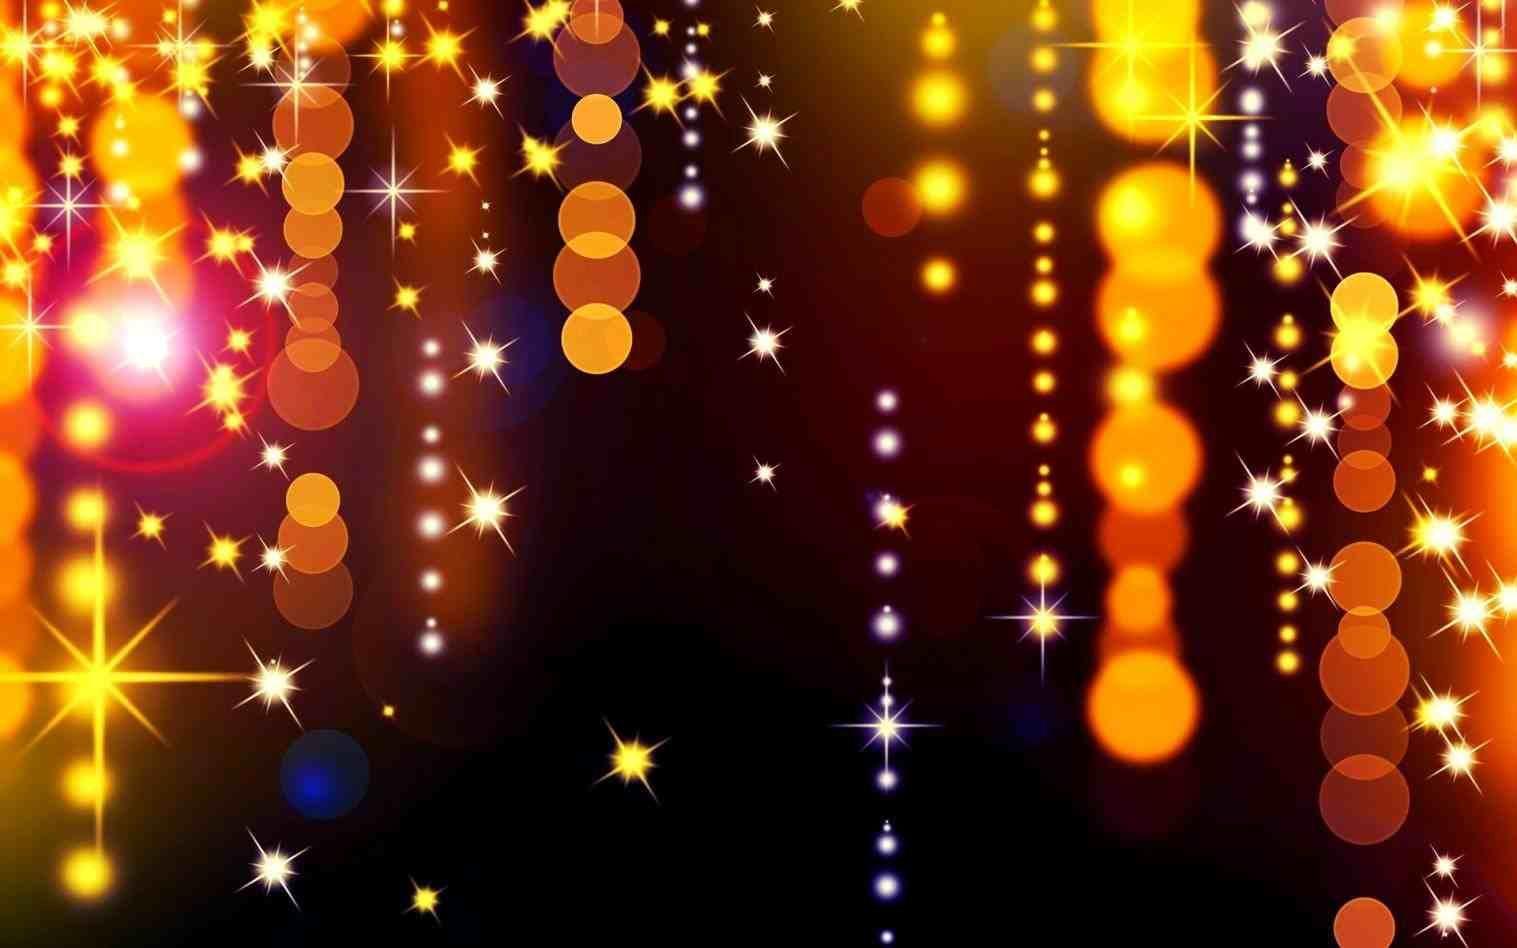 New Post Cute Christmas Lights Wallpaper Iphone